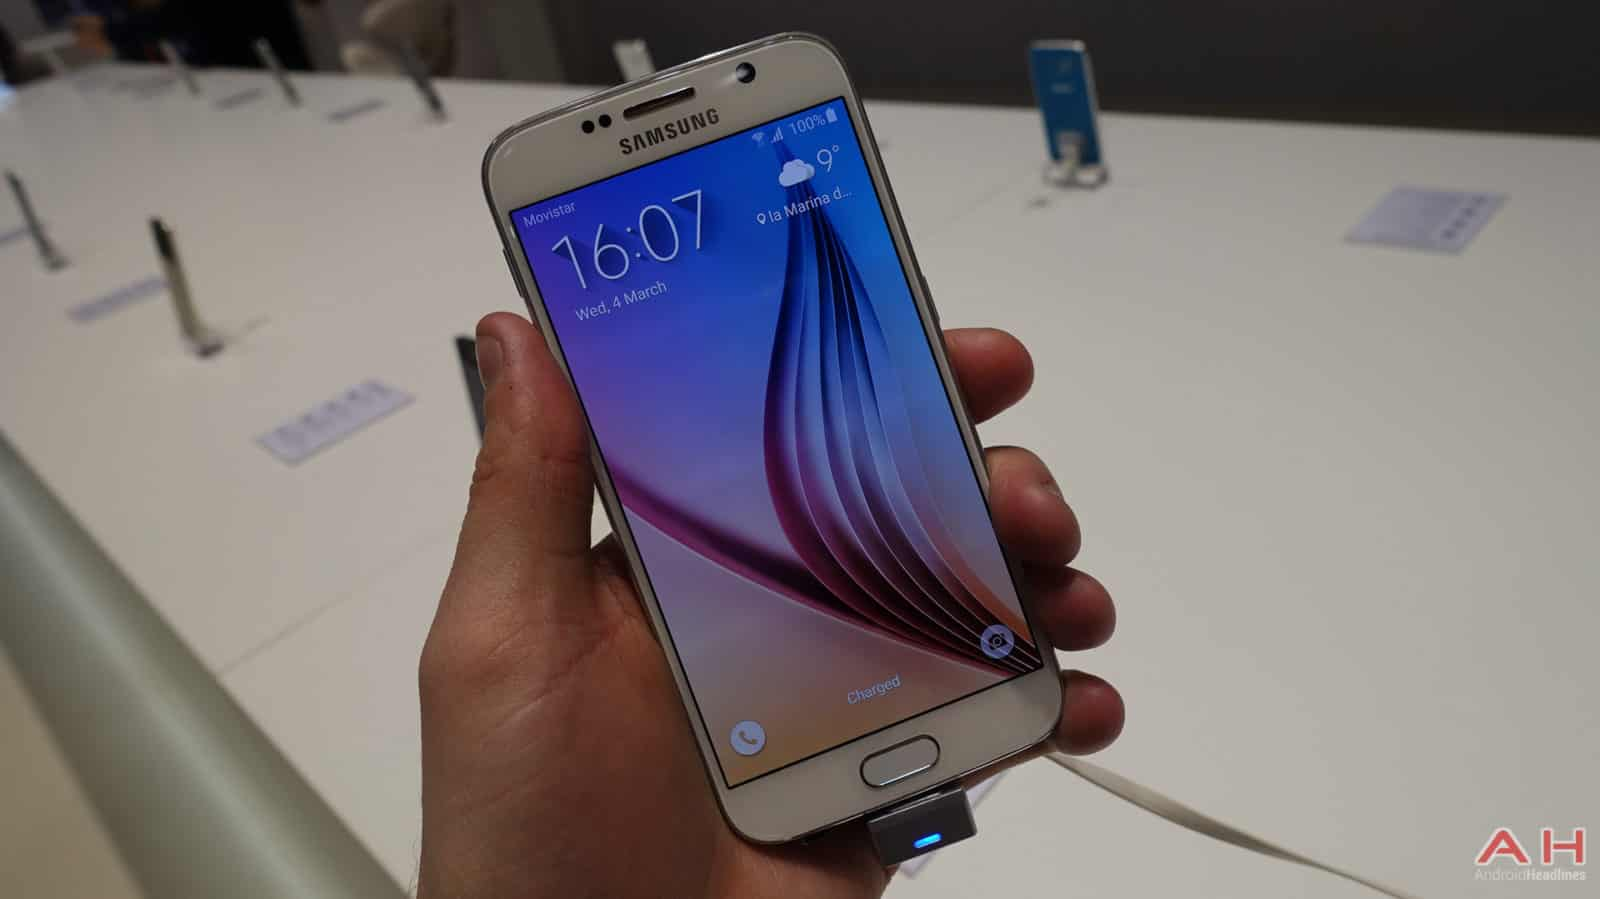 Samsung-Galaxy-S6-Edge-AH-2